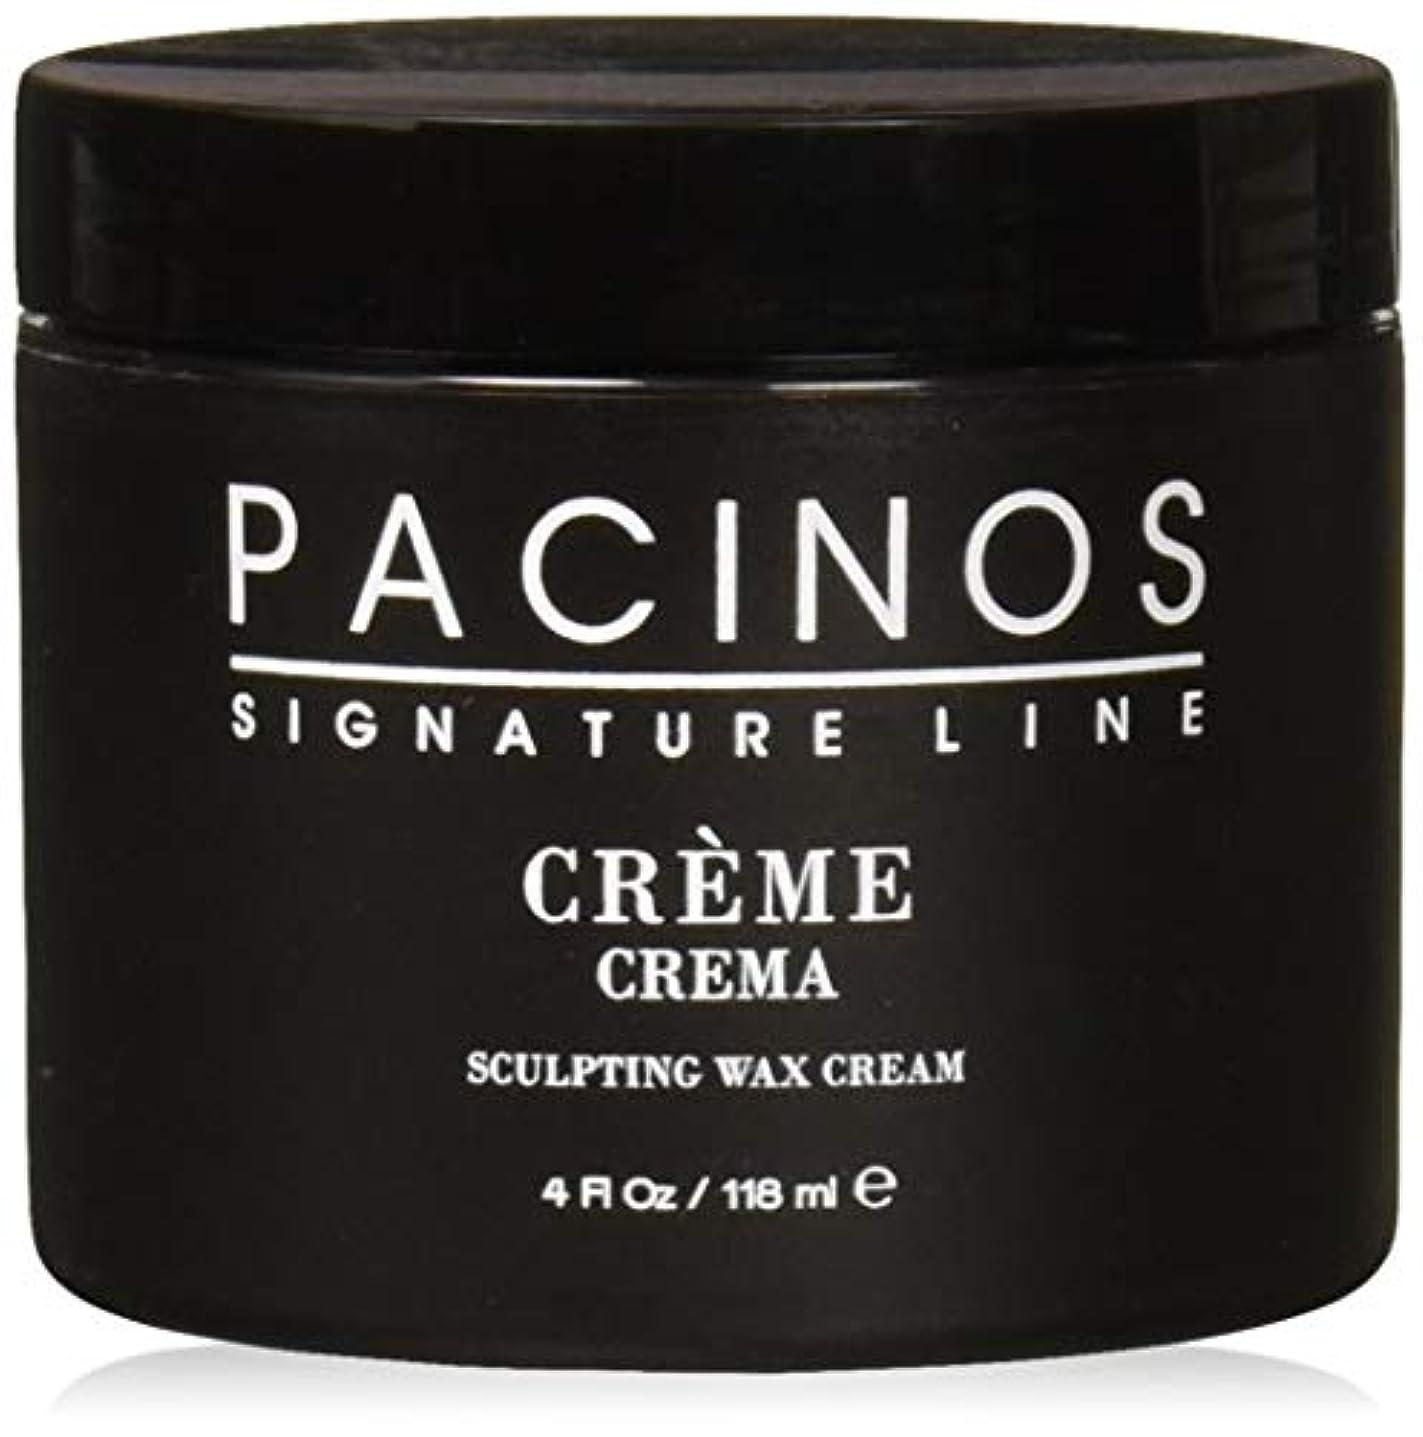 分析的伝染性の偽善Pacinos Grooming Elegance Creme, Sculpting Wax Cream 4oz by Pacinos [並行輸入品]